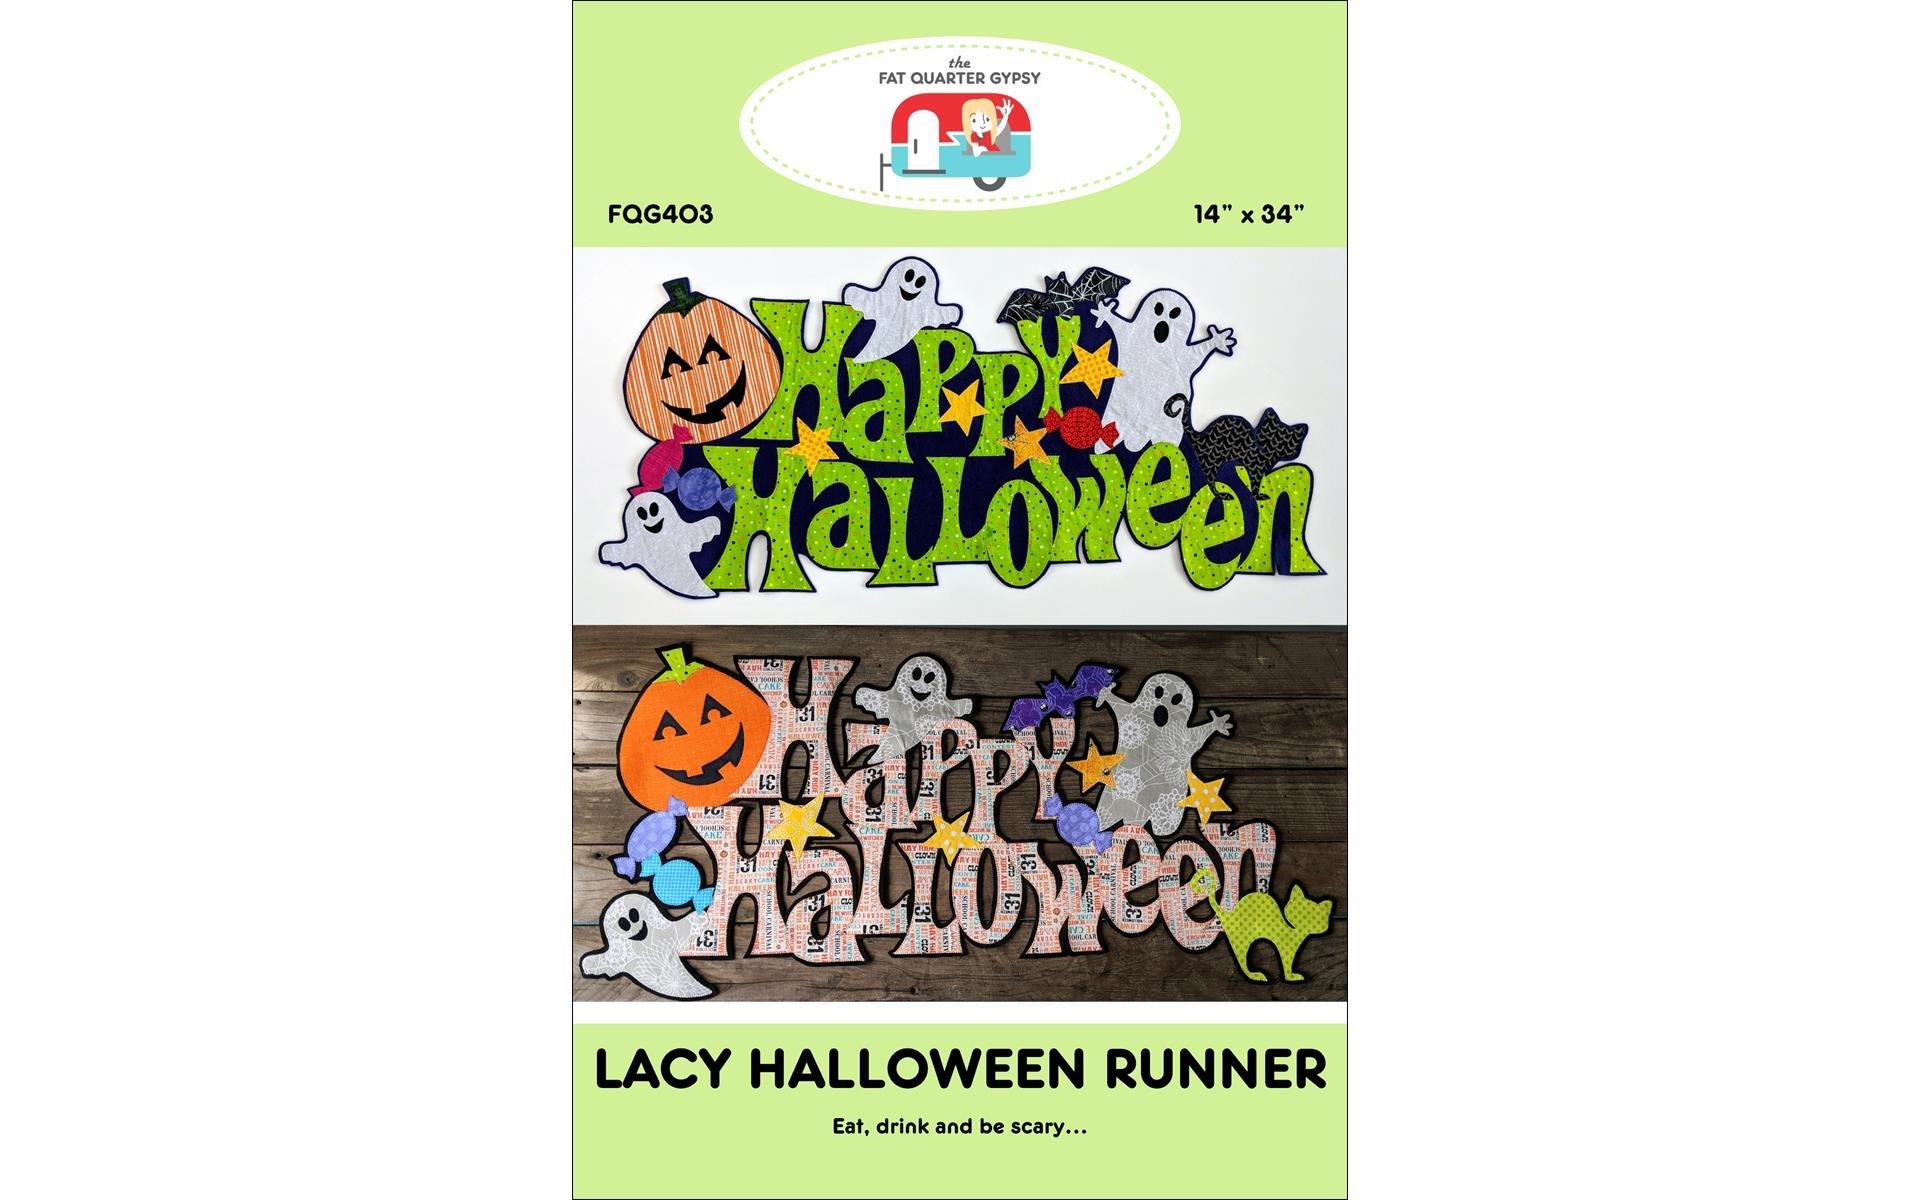 Lacy Halloween Runner